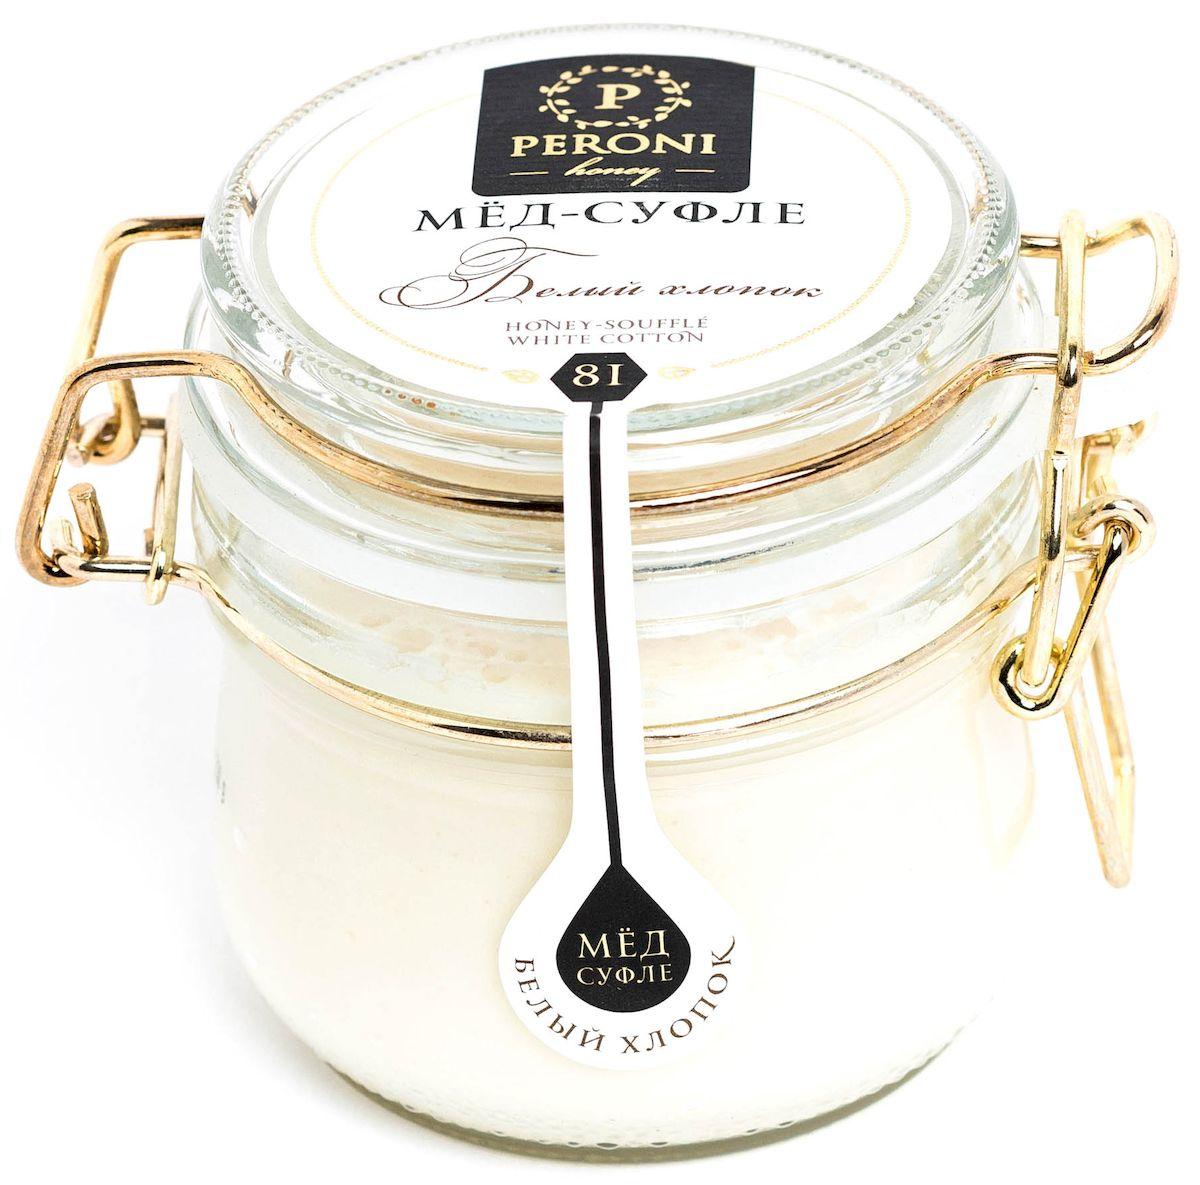 Peroni Белый хлопок мёд-суфле, 230 г мёд суфле смородина 30 мл peroni honey